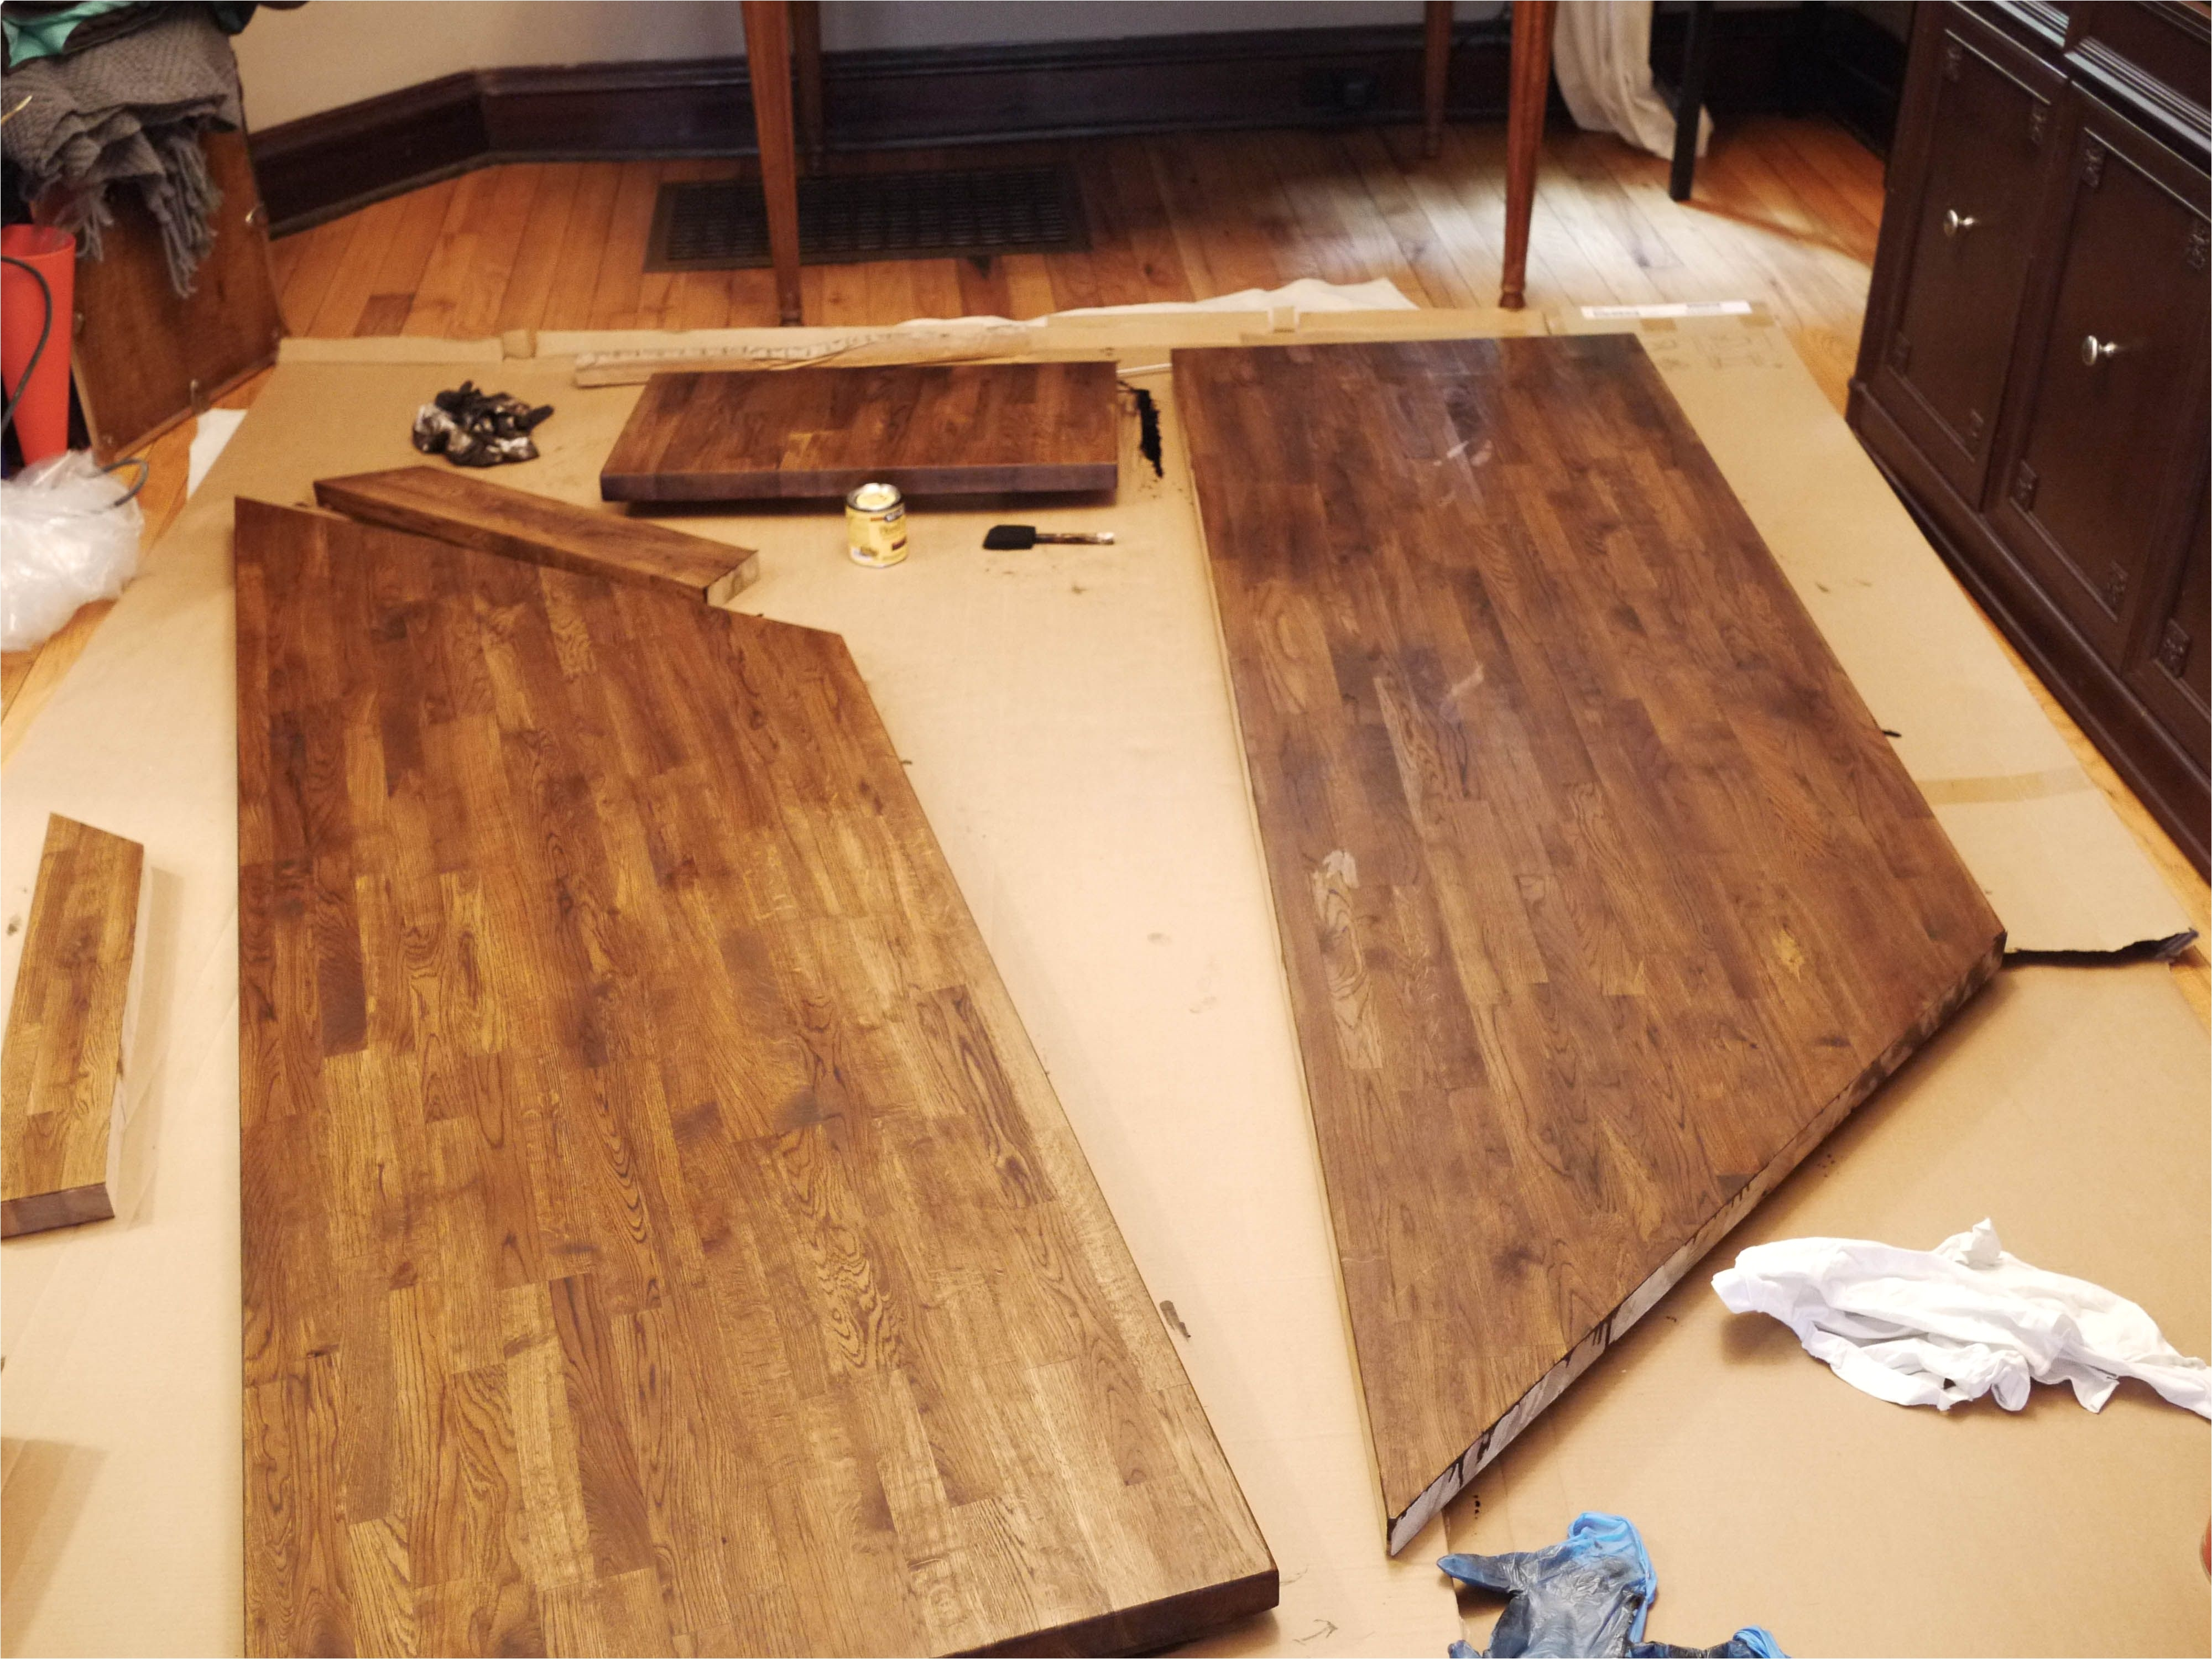 diy ikea butcher block countertops as desk ikea butcherblock countertops part 1